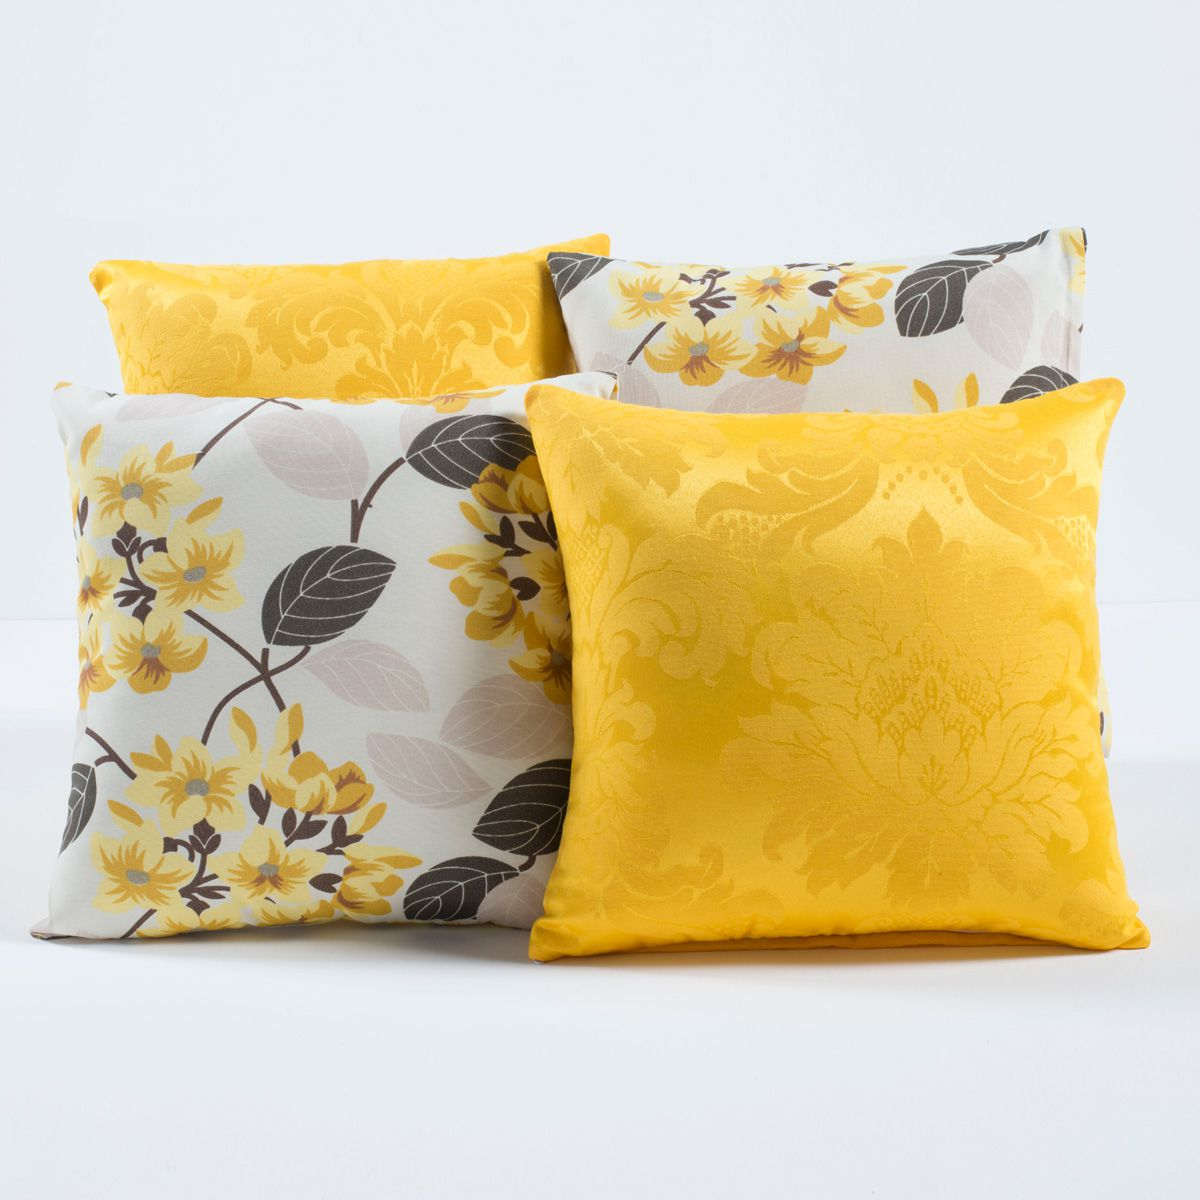 Kit Capas de Almofadas Decorativas Floral Amarelo/Branco 04 Peças